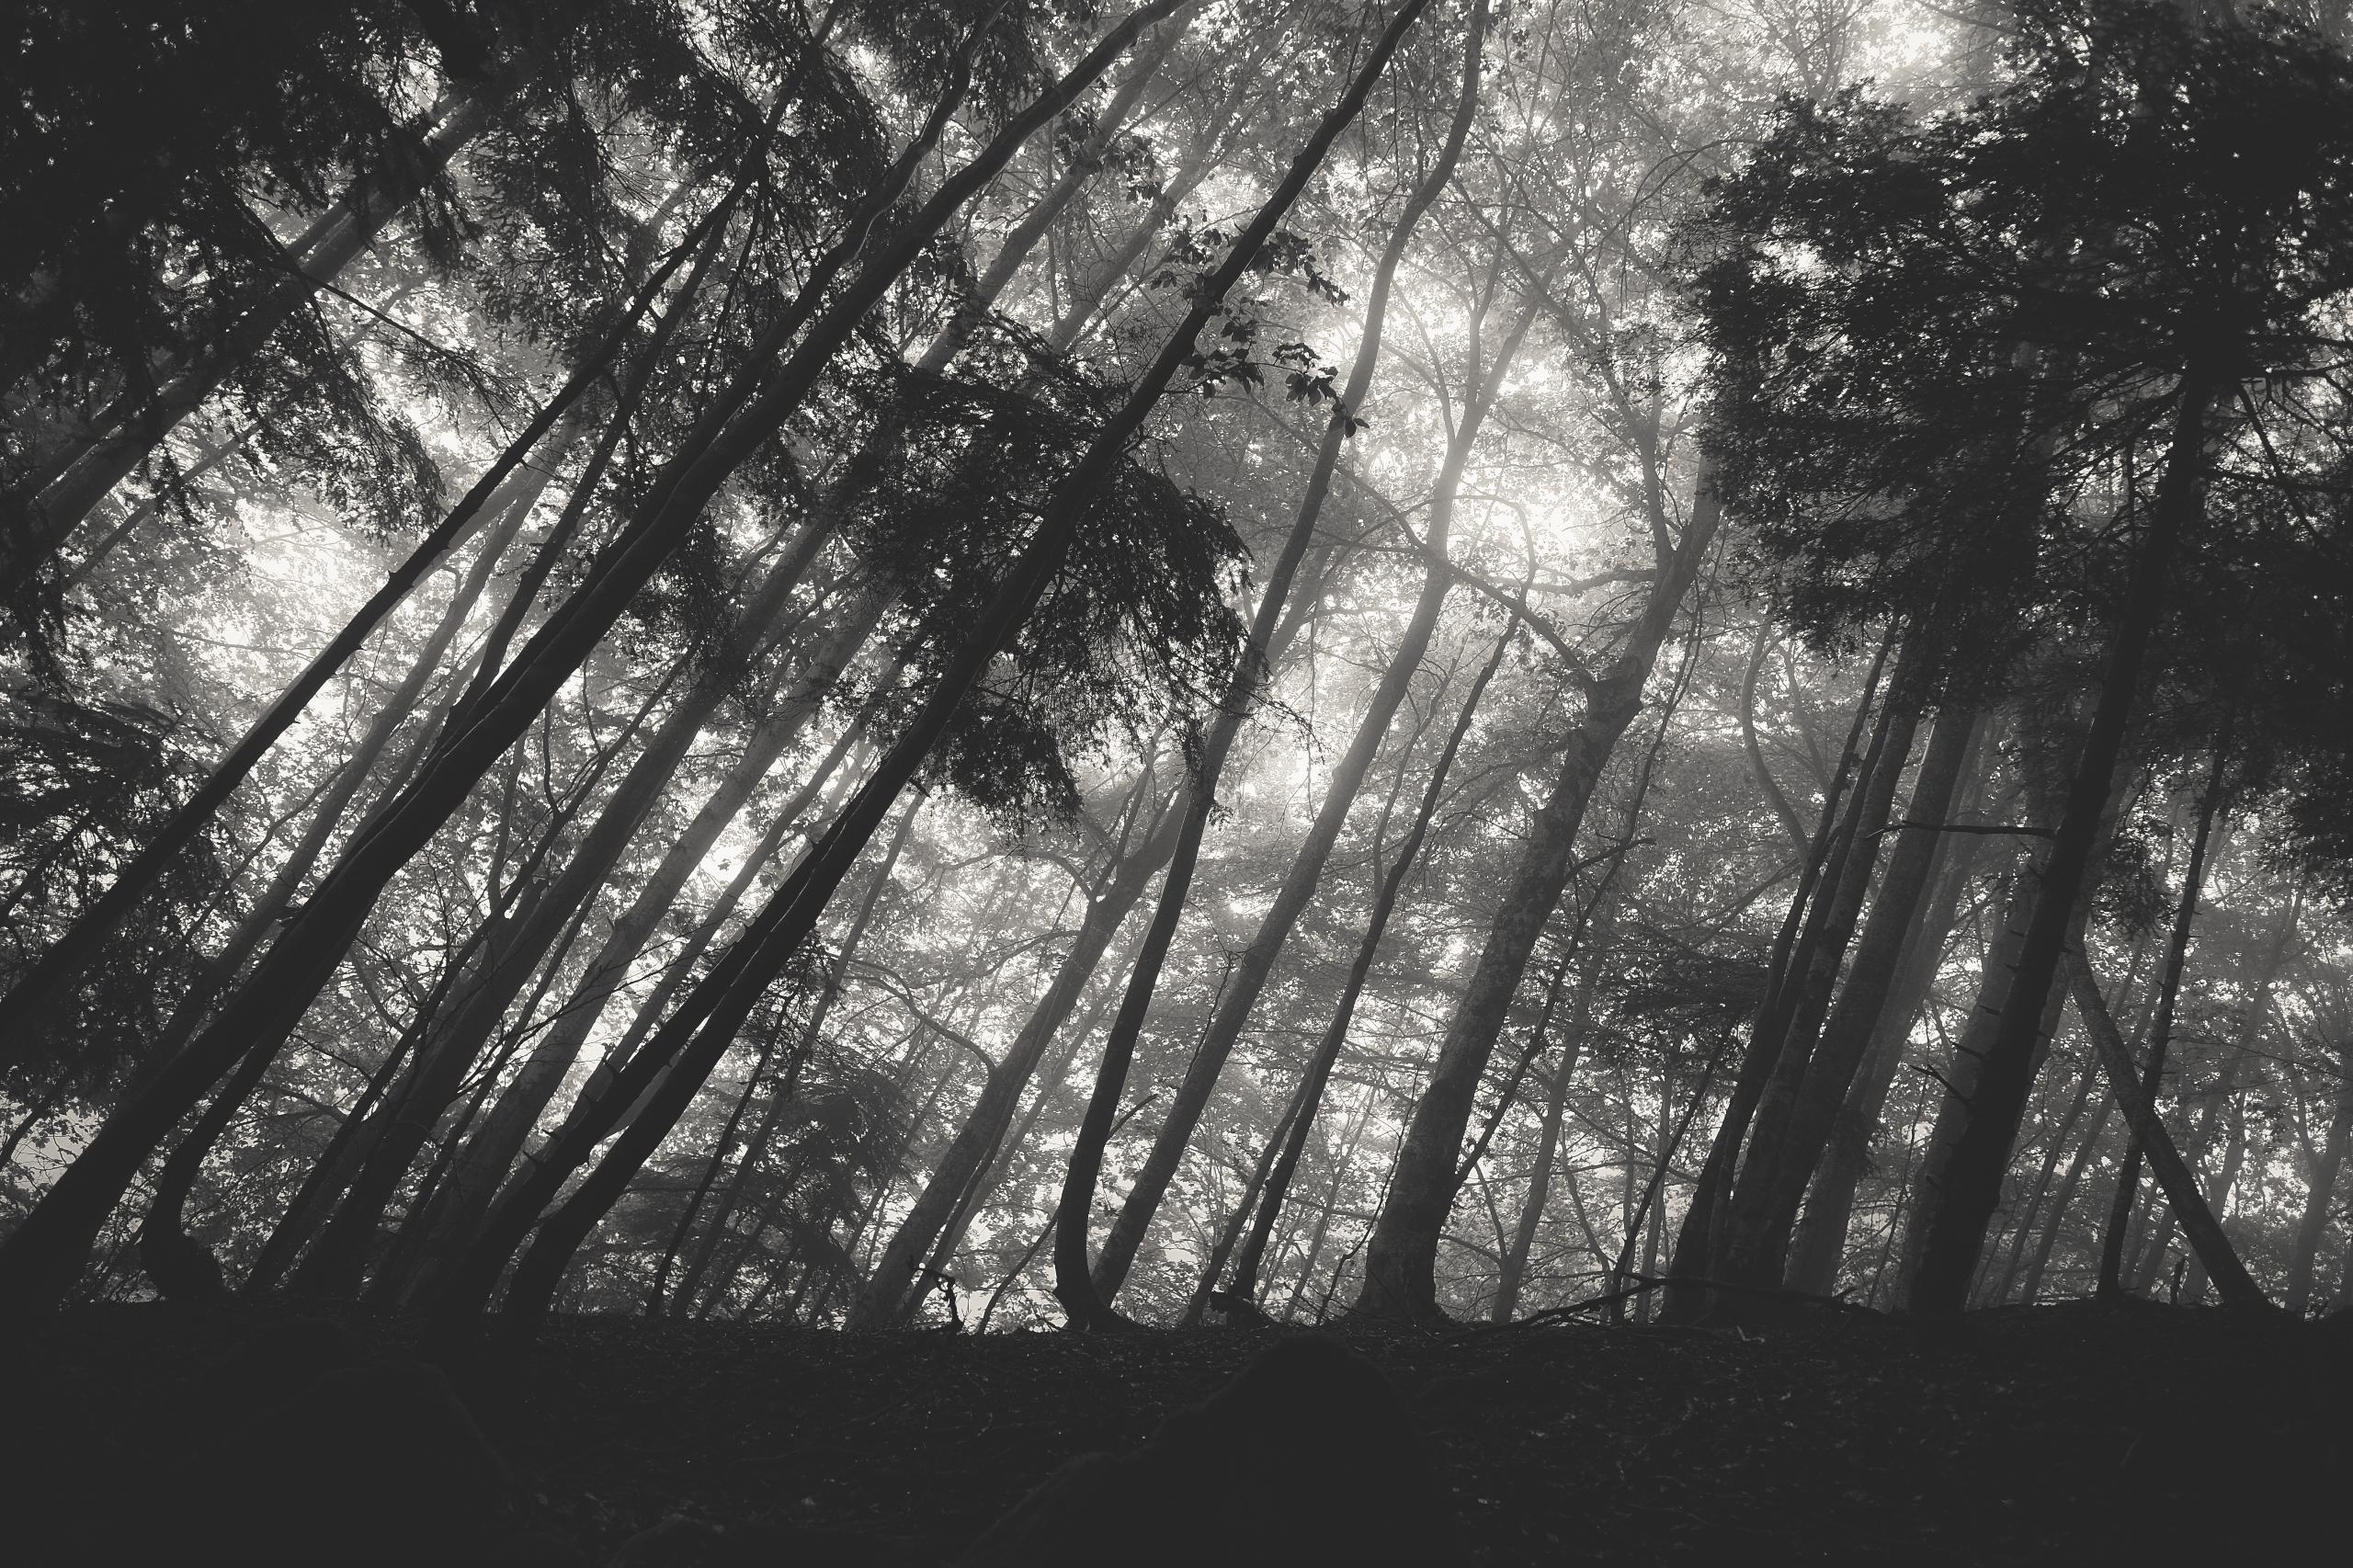 fujifilm, photography, outdoors - yooyye   ello